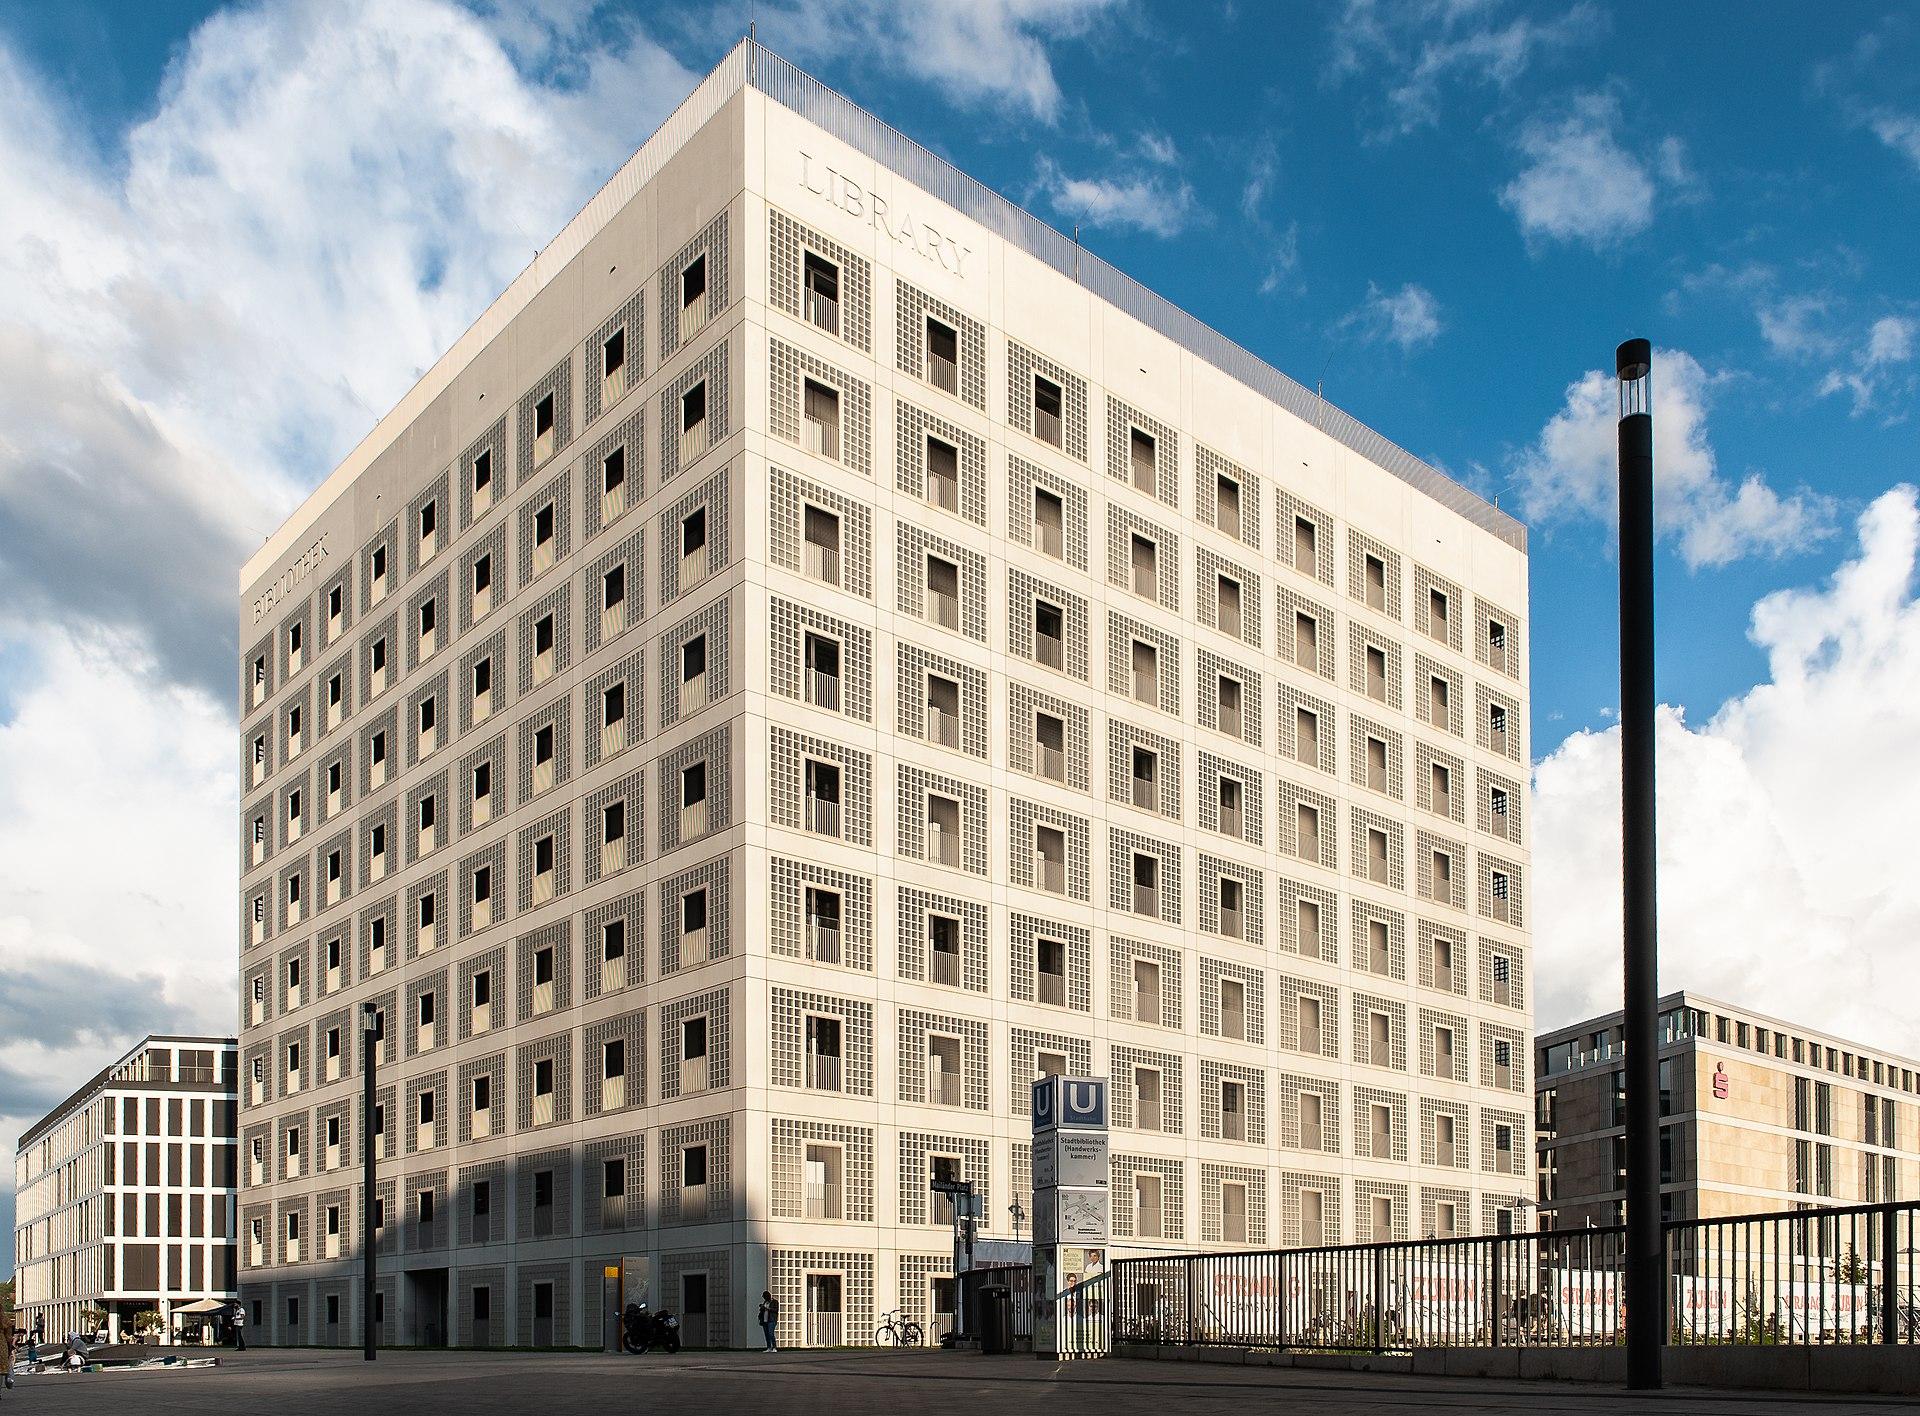 1920px-StadtBibliothekStuttgart-pjt3-18.jpg